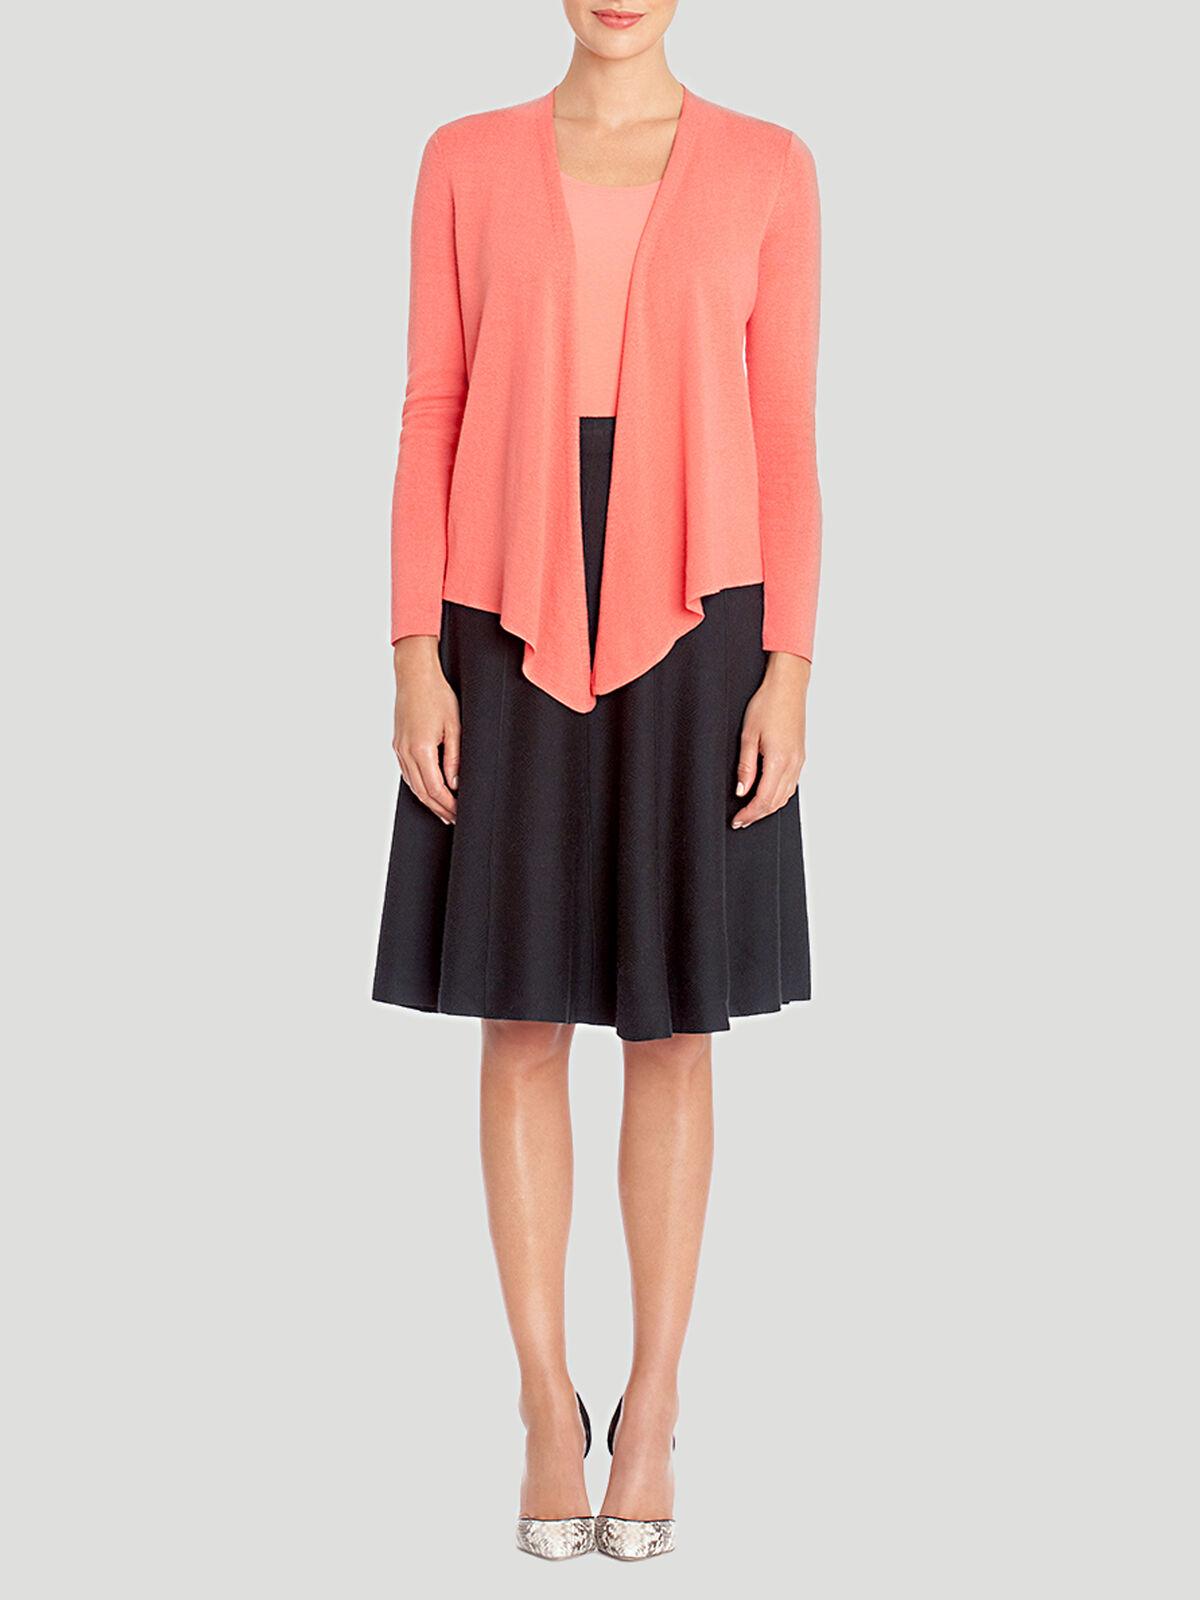 Paneled Twirl Skirt